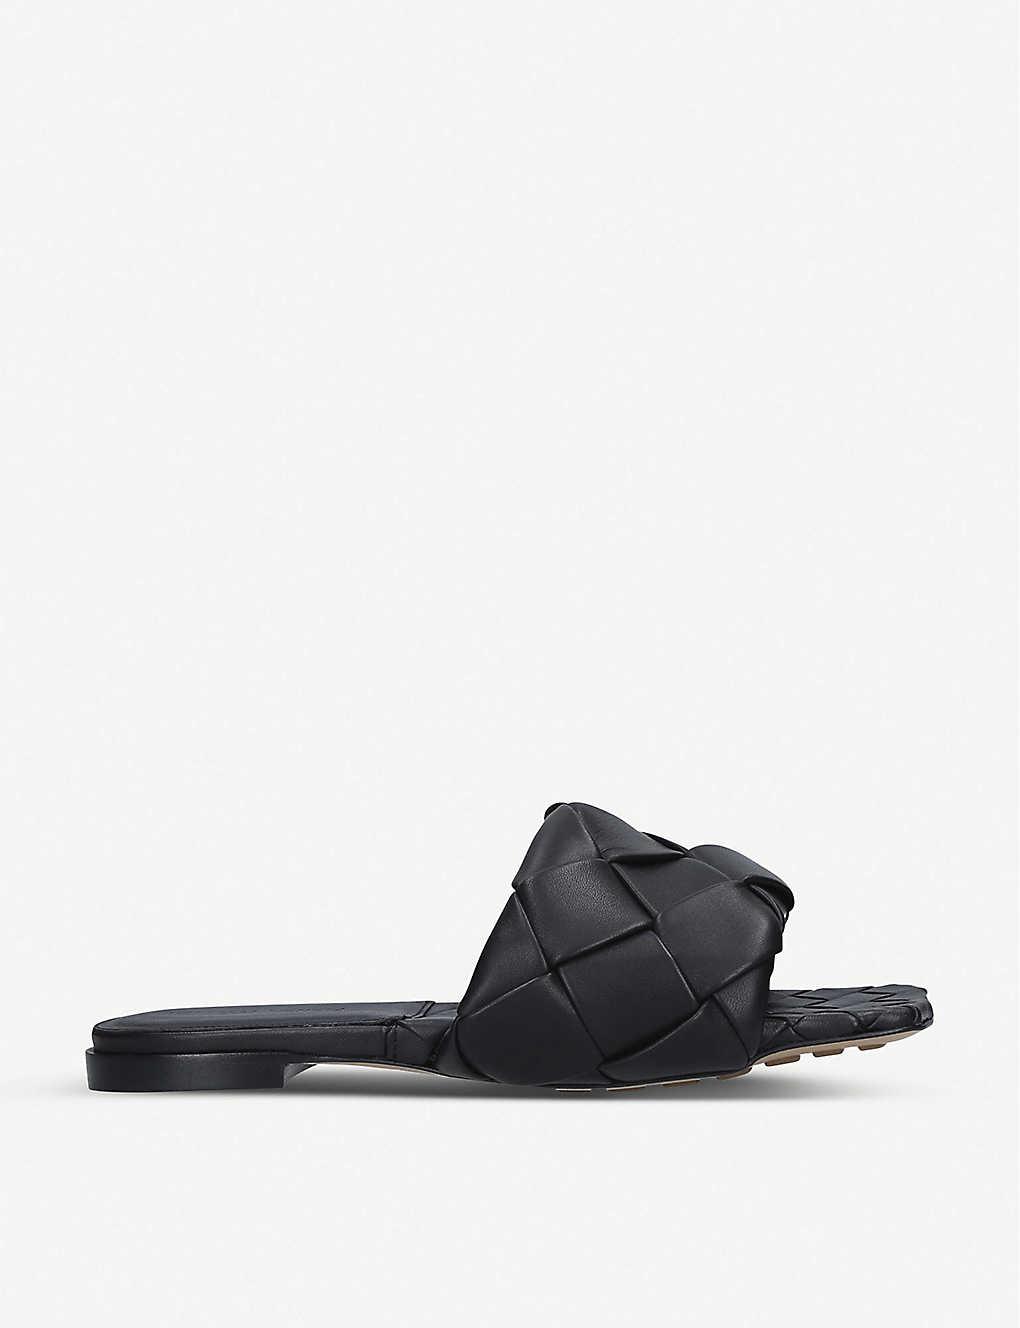 BOTTEGA VENETA BV Lido Intrecciato woven leather mules. #